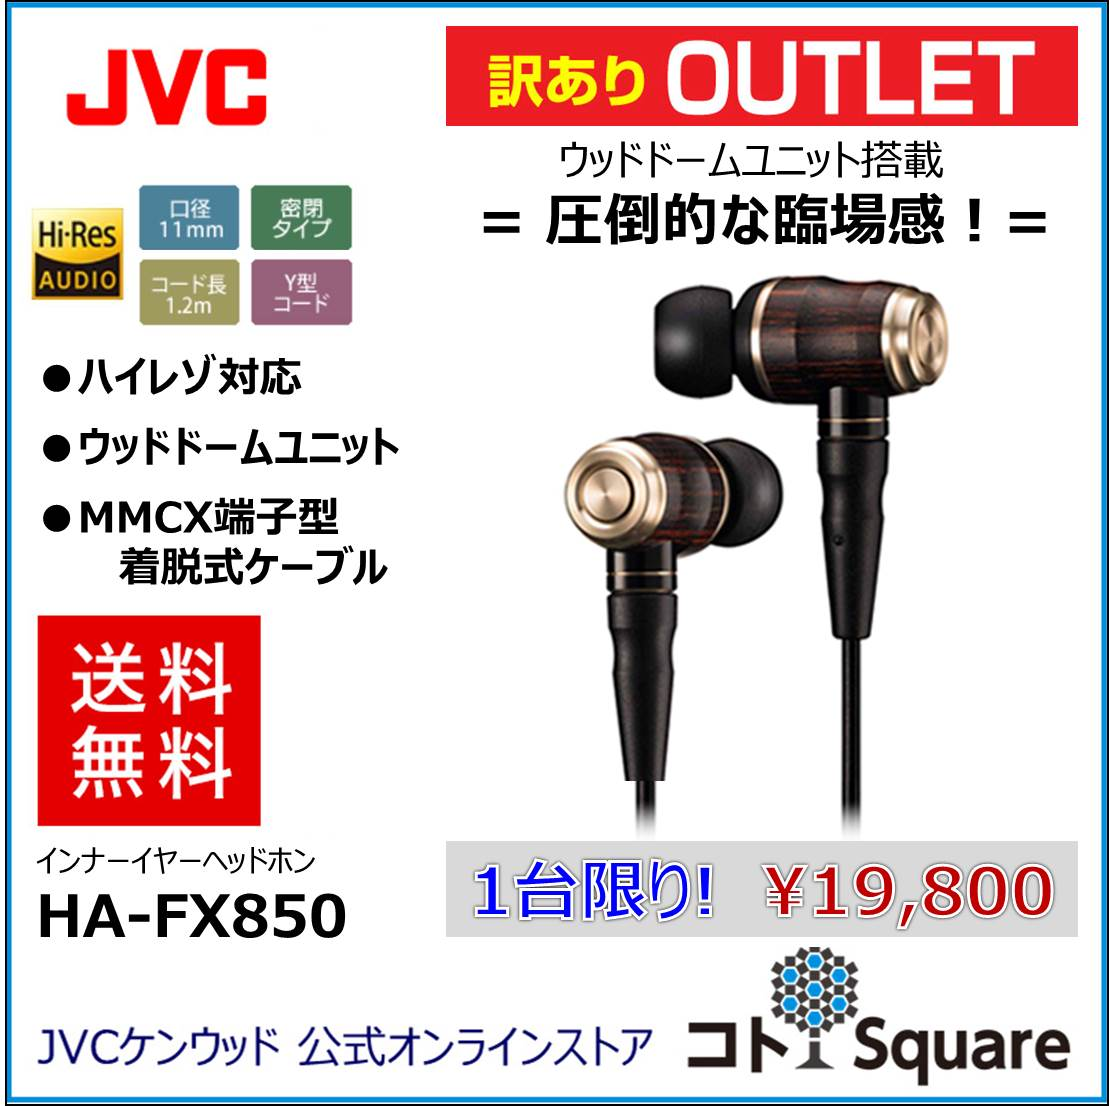 https://item.rakuten.co.jp/kotosquare-jvckenwood/10000100/